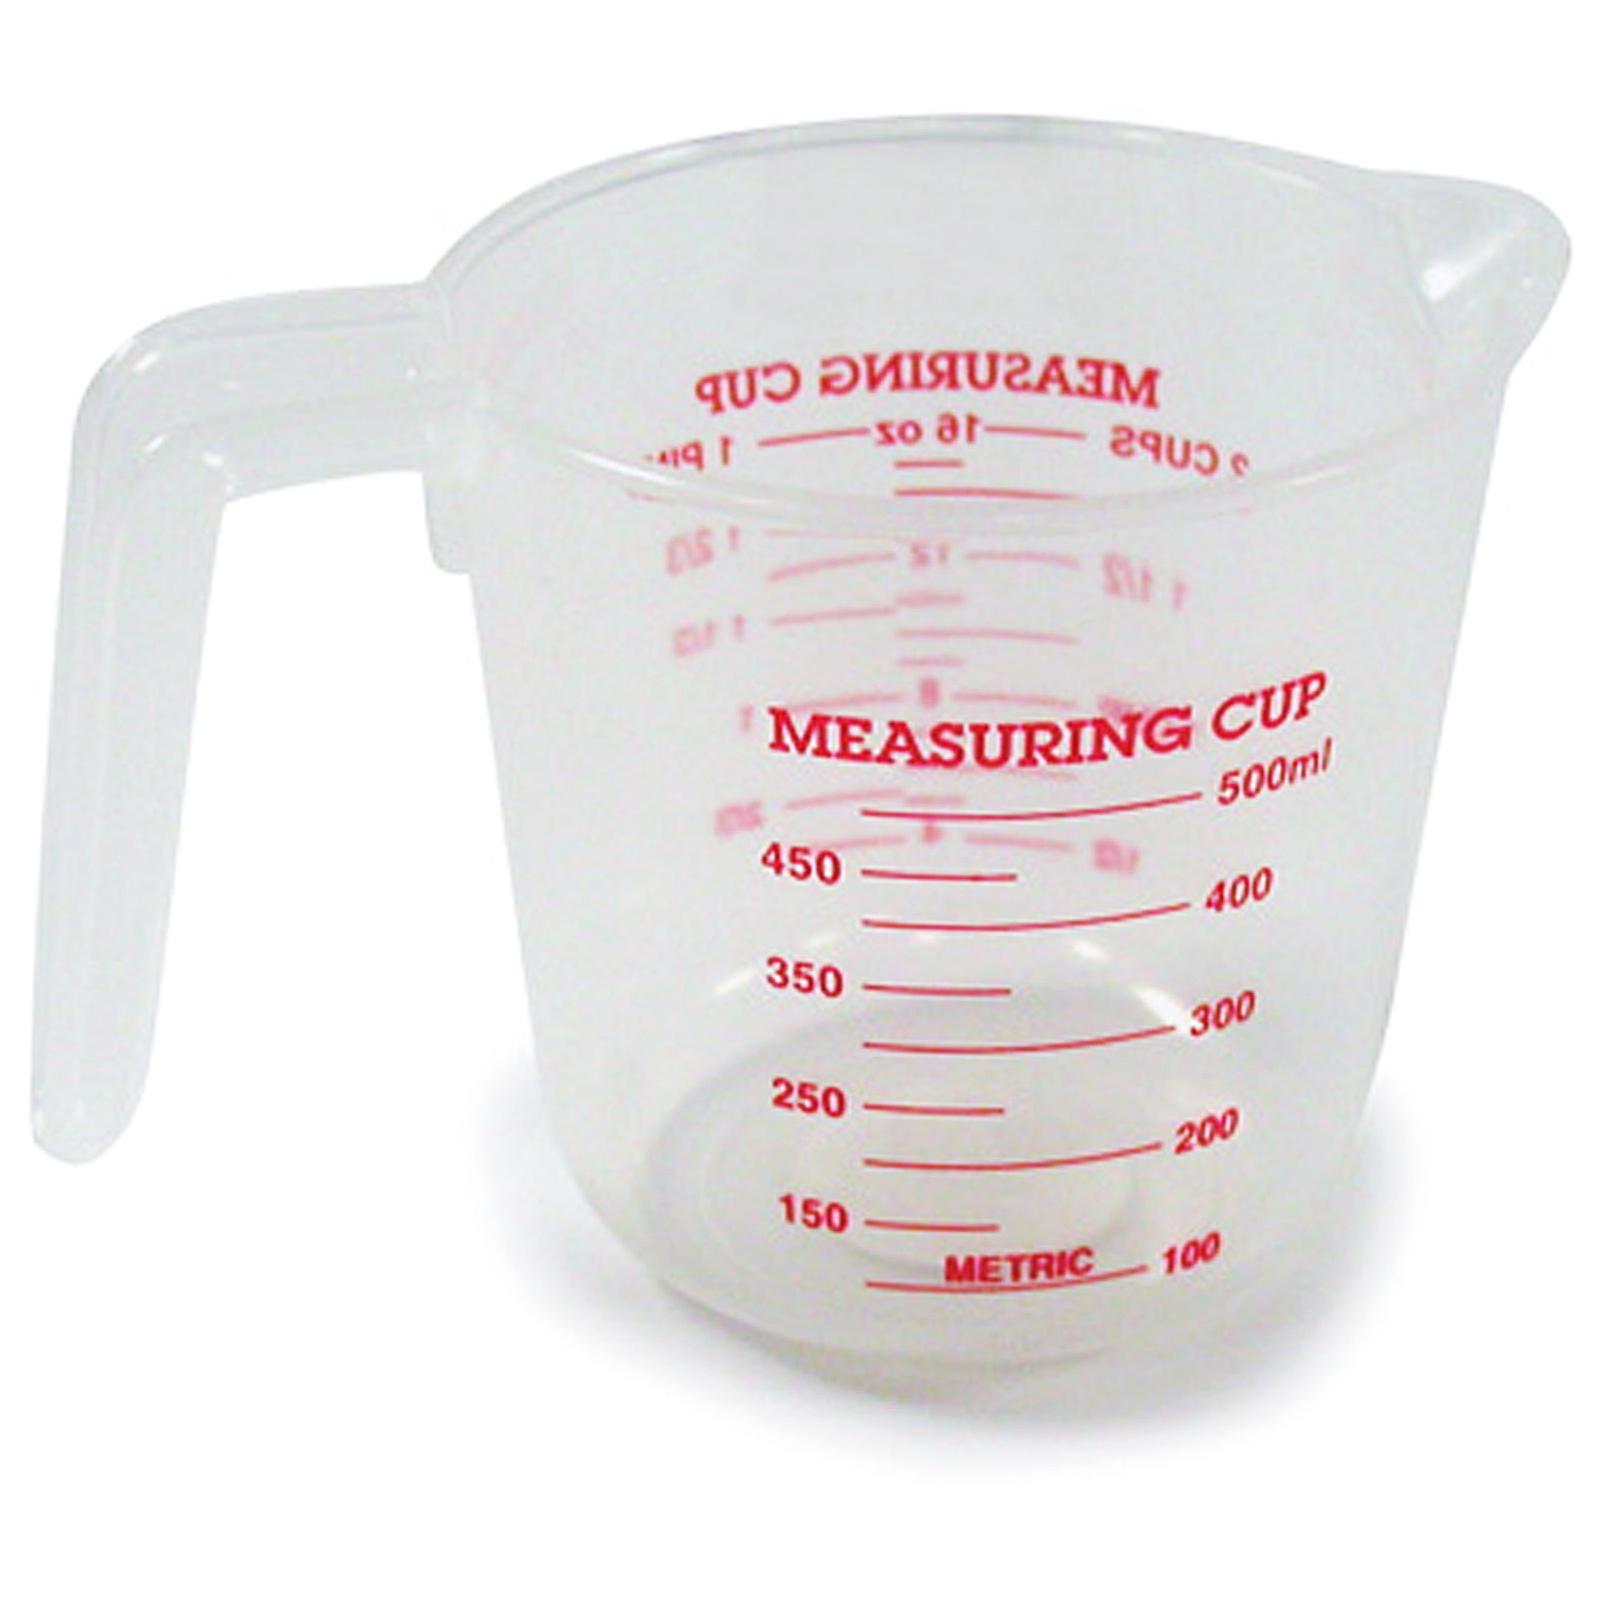 Norpro 2 Cup Measuring Cup